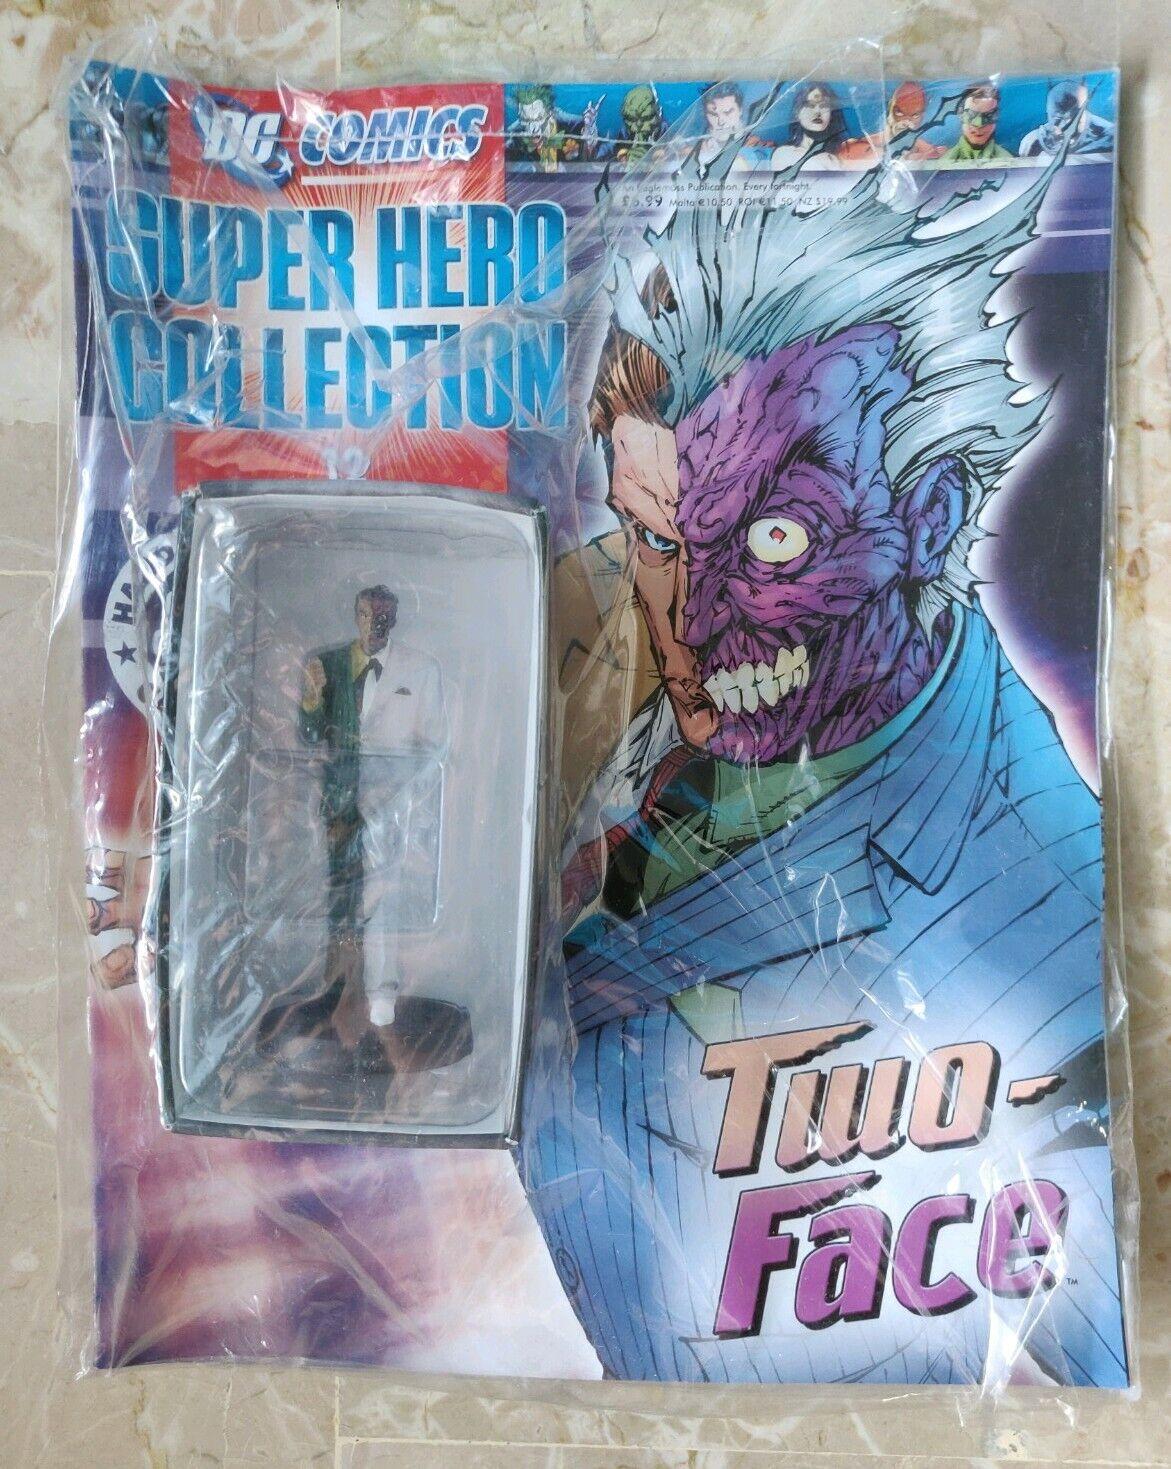 DC COMICS SUPER HERO COLLECTION SIGILLATO 12 TWO FACEVERS.  INGLESE EAGLEMOSS  online economico